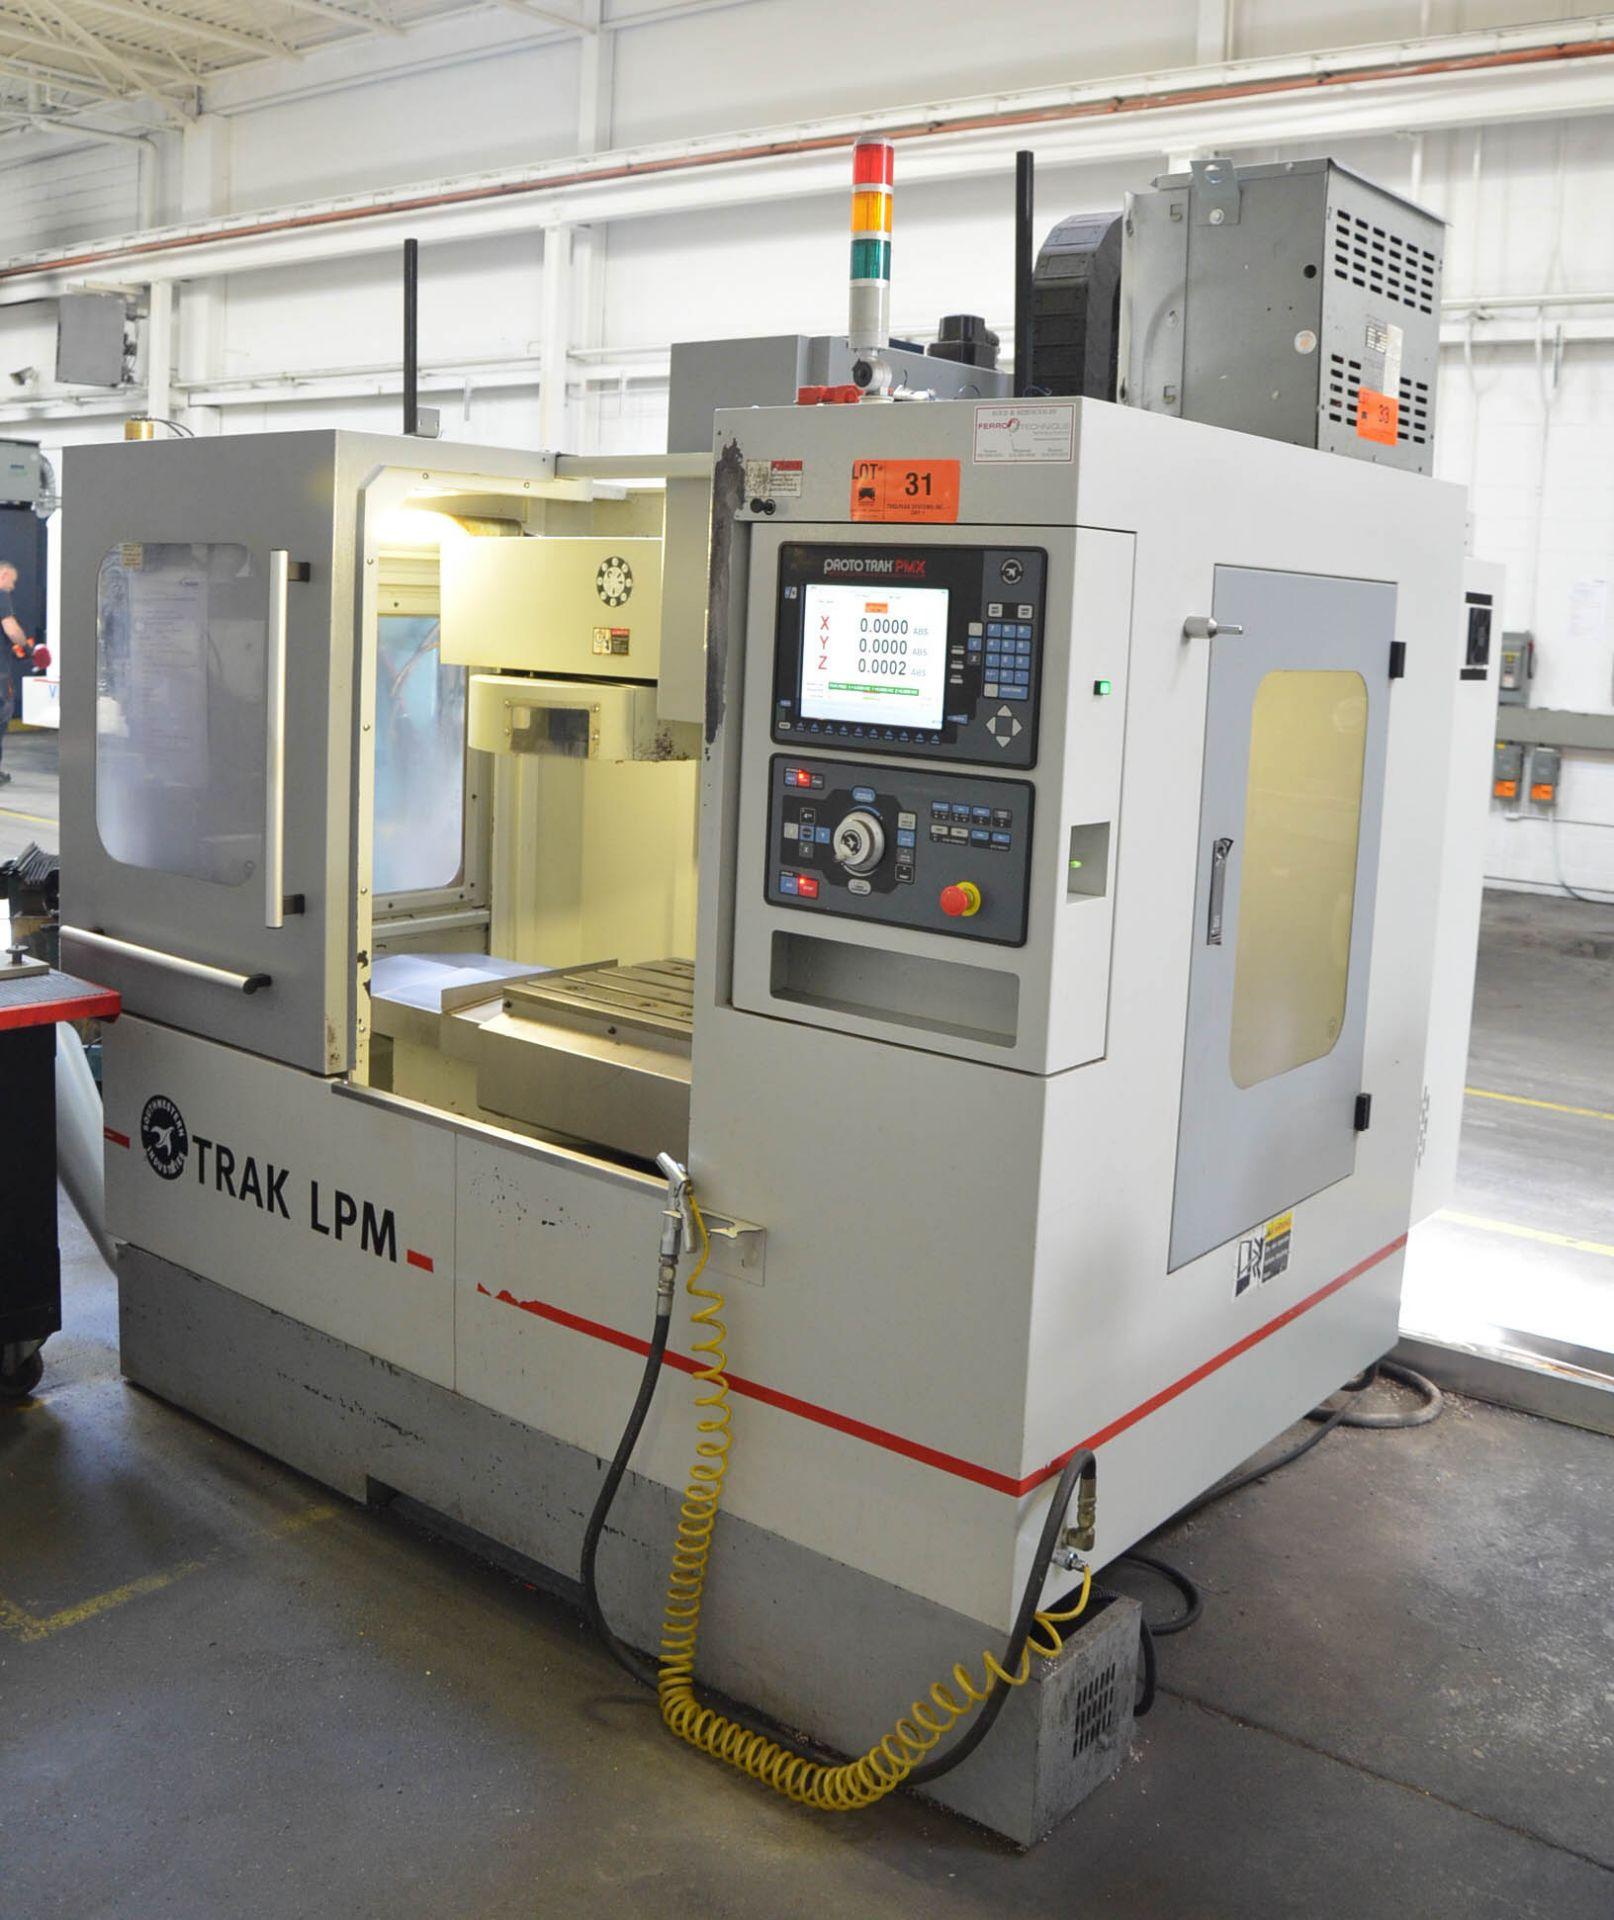 SWI (2014) TRAK LPM 4-AXIS READY CNC VERTICAL MACHINING CENTER WITH PROTO TRAK PMX CNC CONTROL, 19. - Image 3 of 12